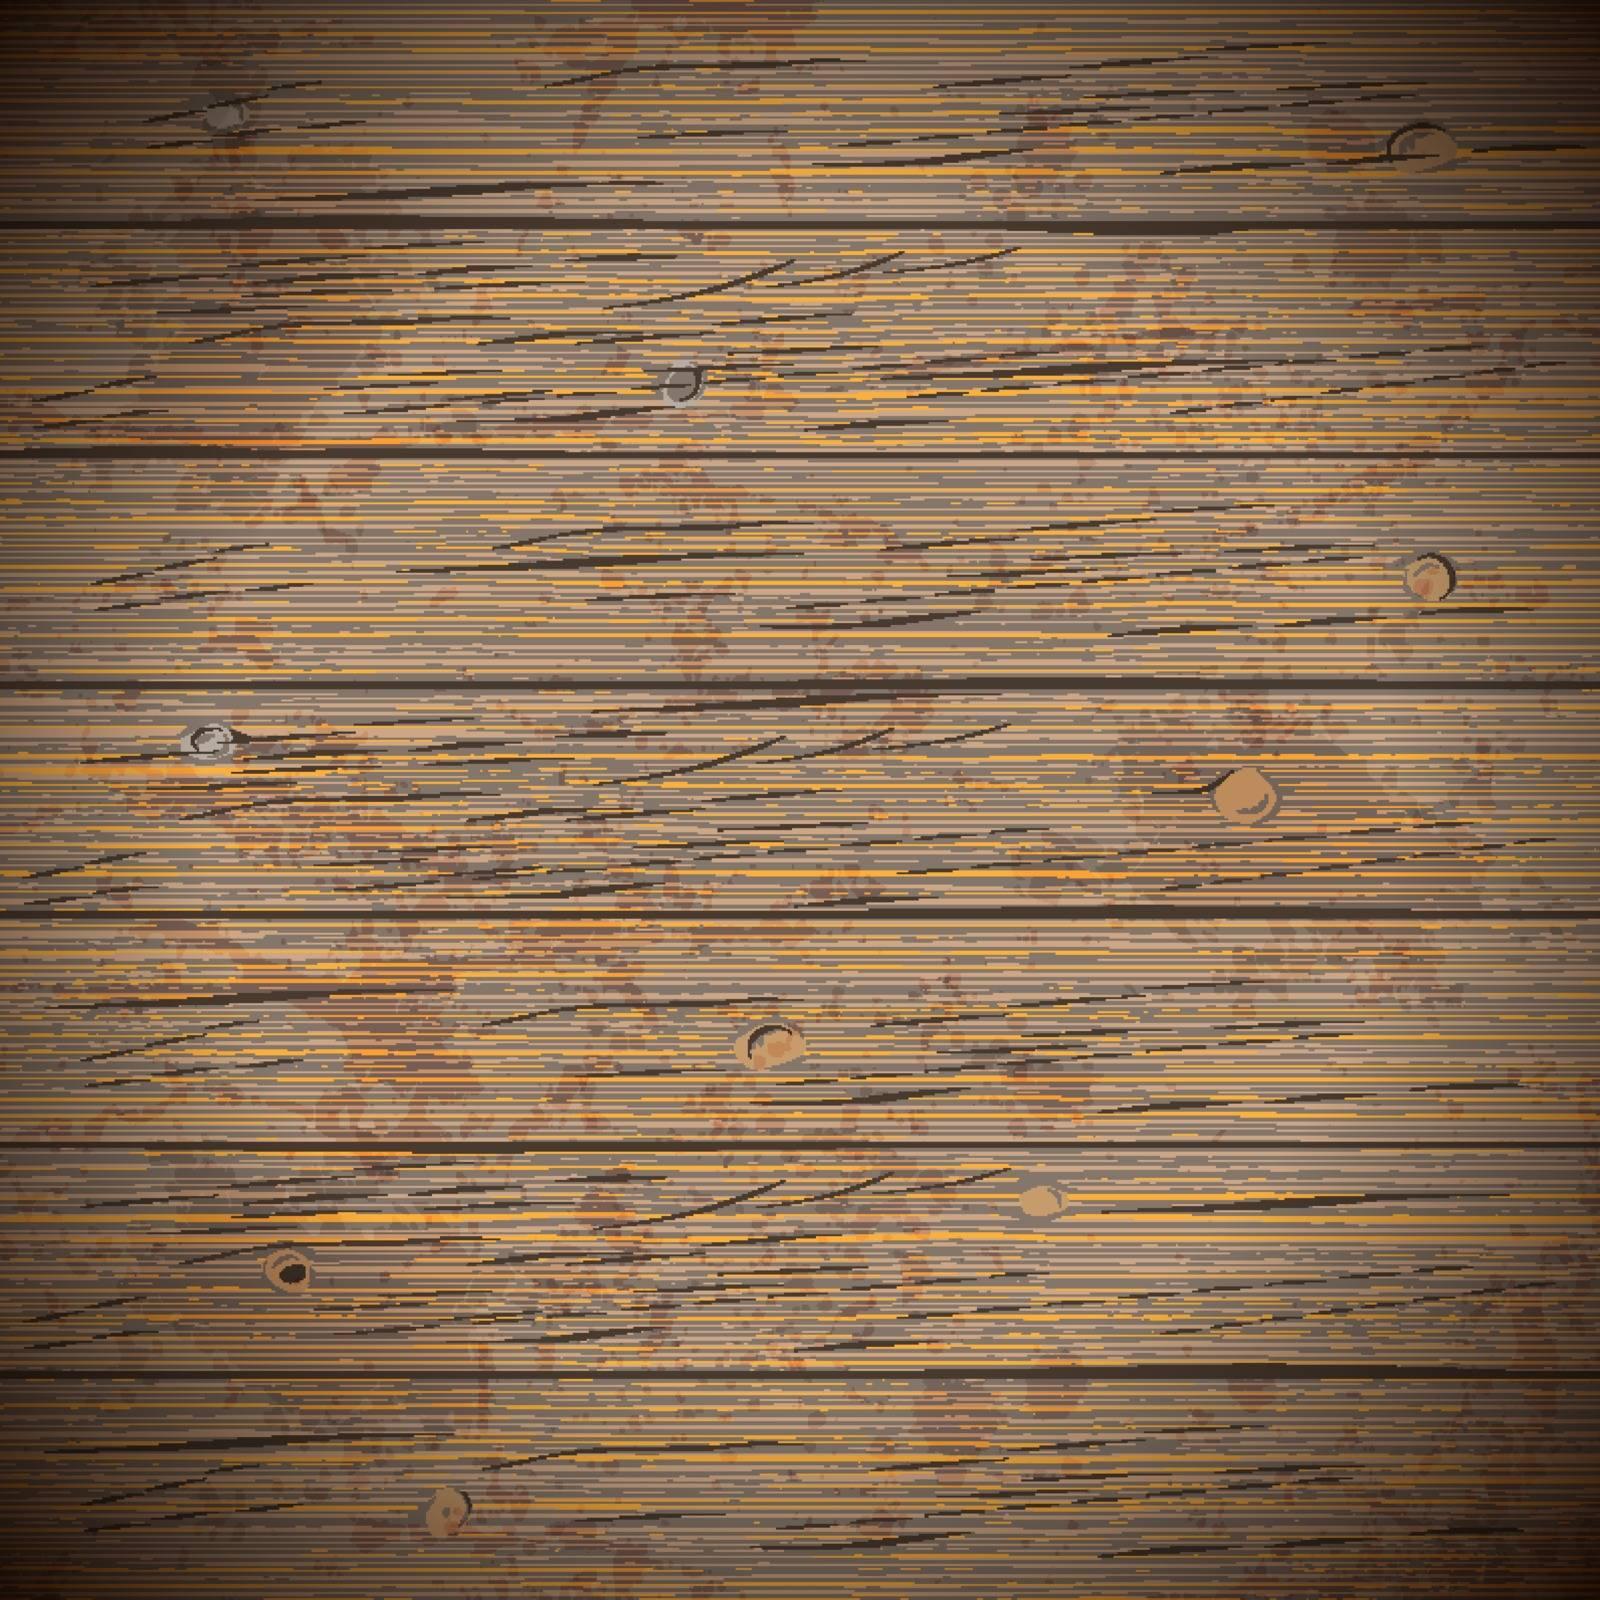 Rustic wood planks vintage background. Vector illustration.